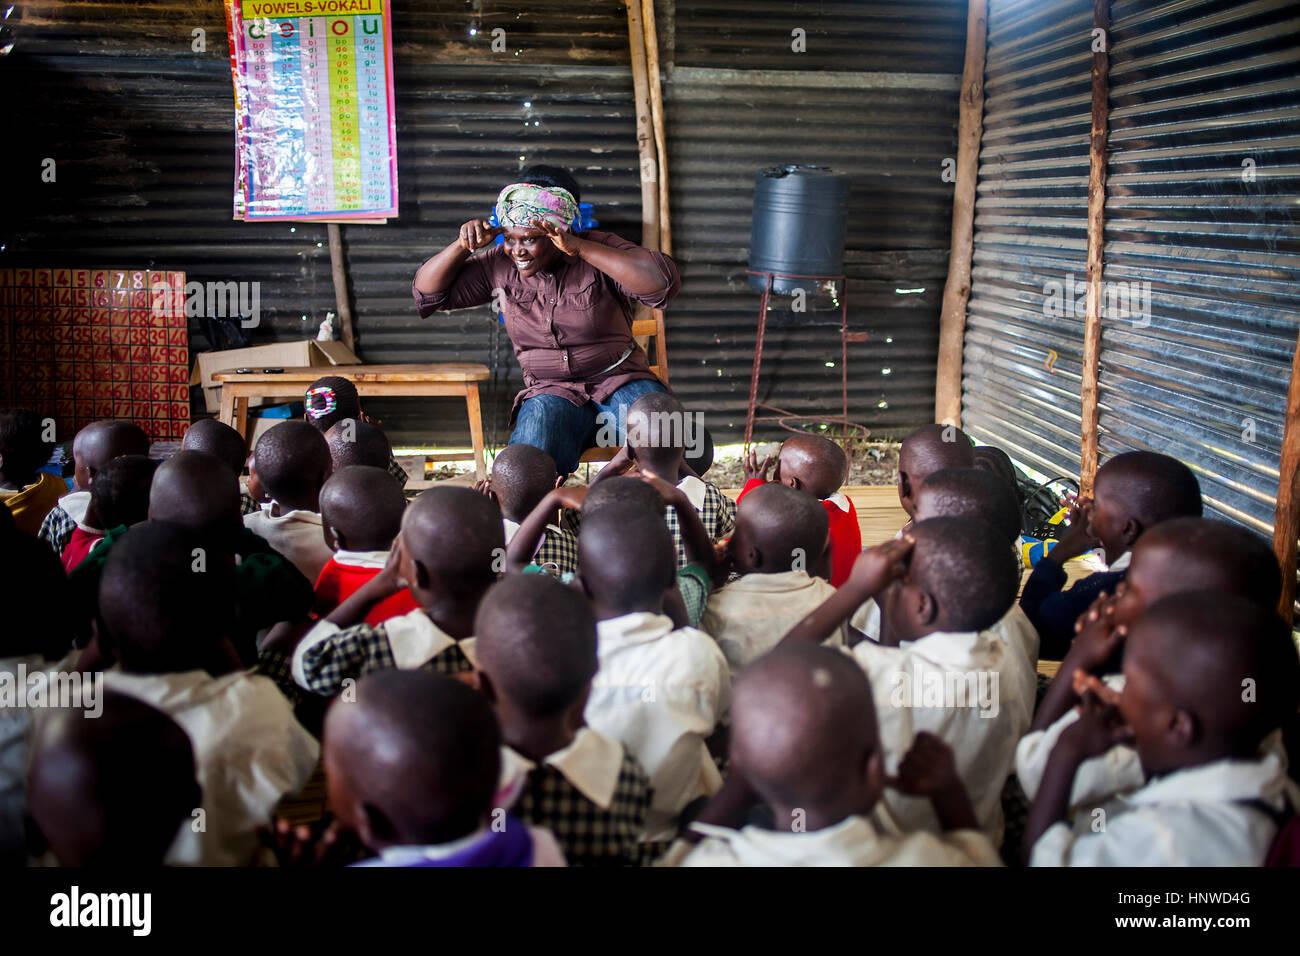 School, the fishing village of Litari, Rusinga Island, Lake Victoria, Kenya - Stock Image